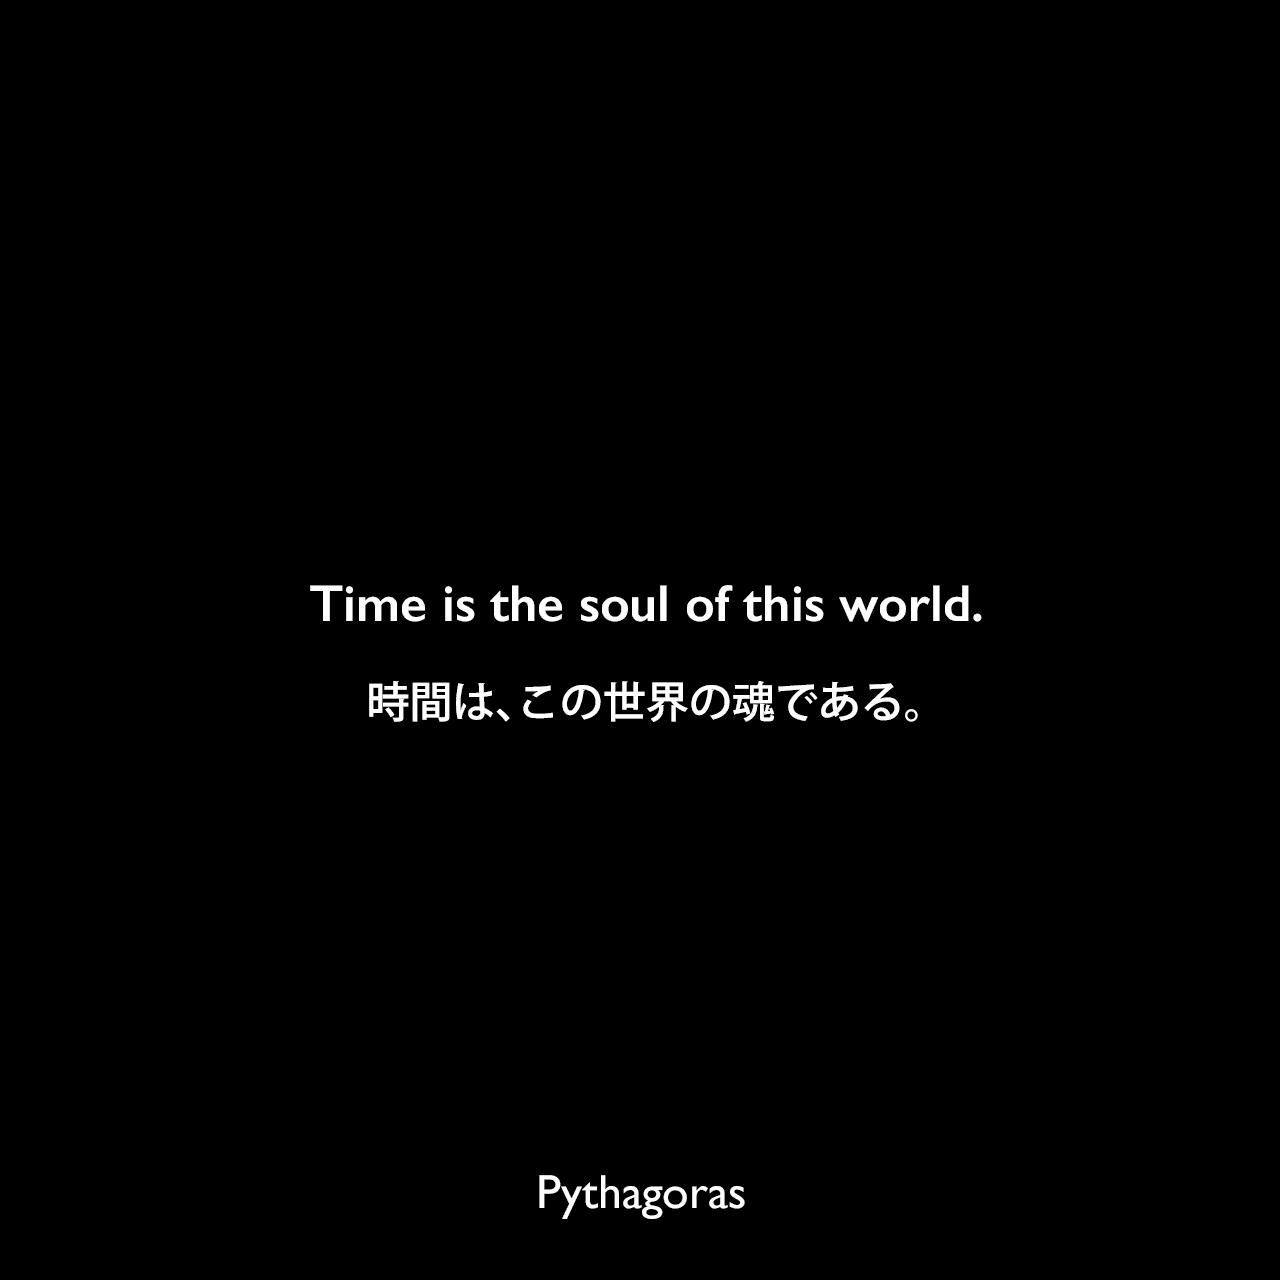 Time is the soul of this world.時間は、この世界の魂である。- Desmond MacHaleの本「Wisdom」より